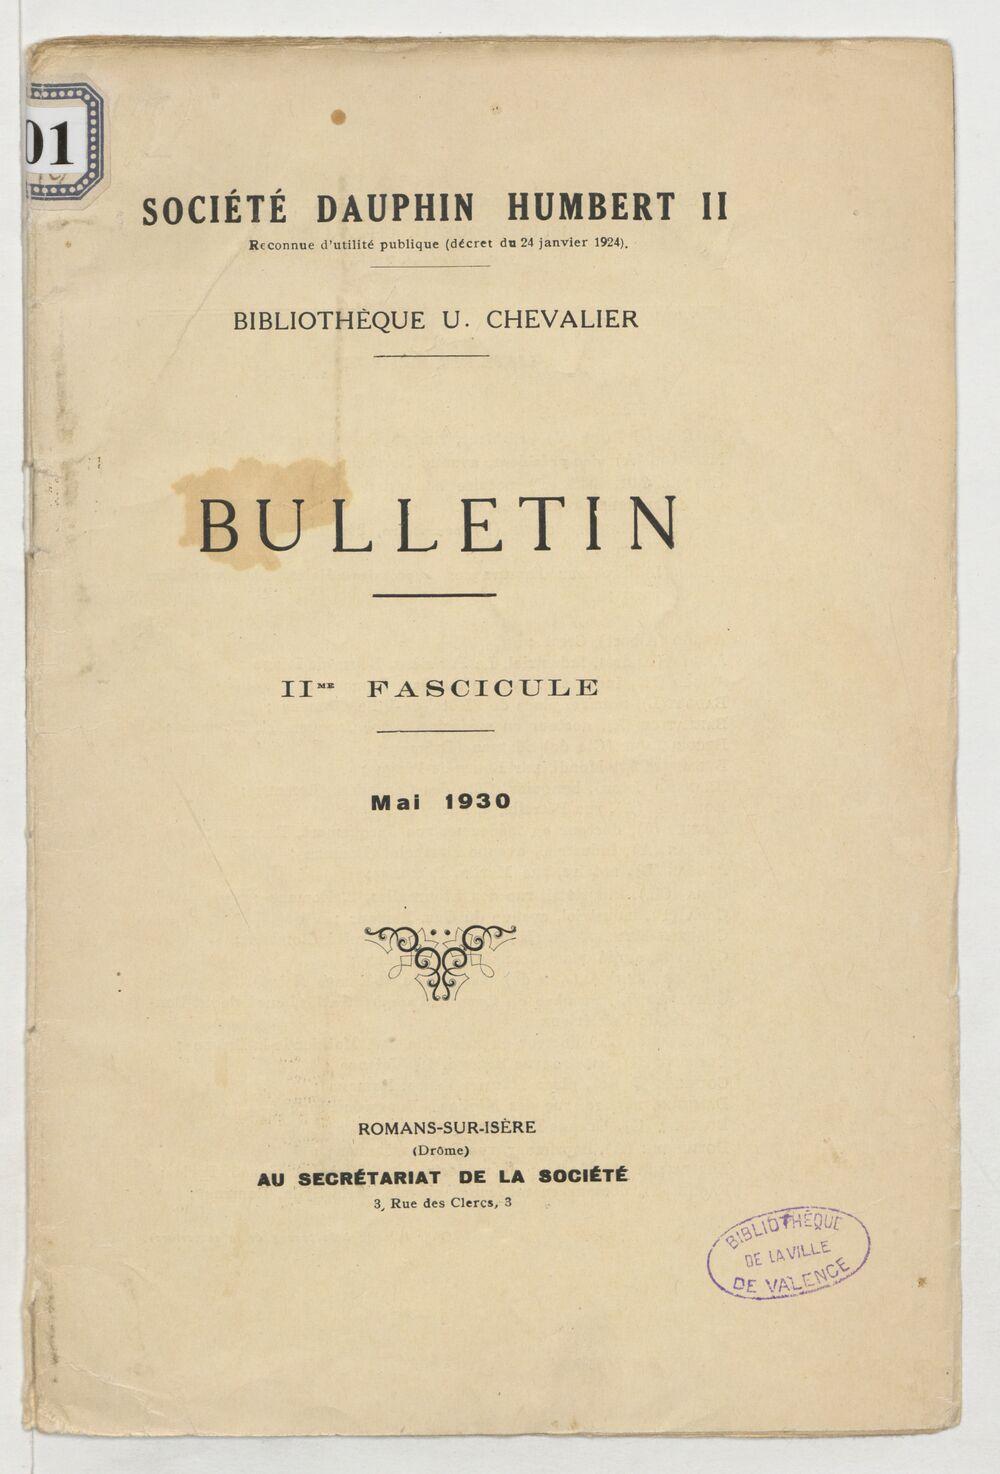 Bulletin : bibliothèque U. Chevalier / Société Dauphin Humbert II